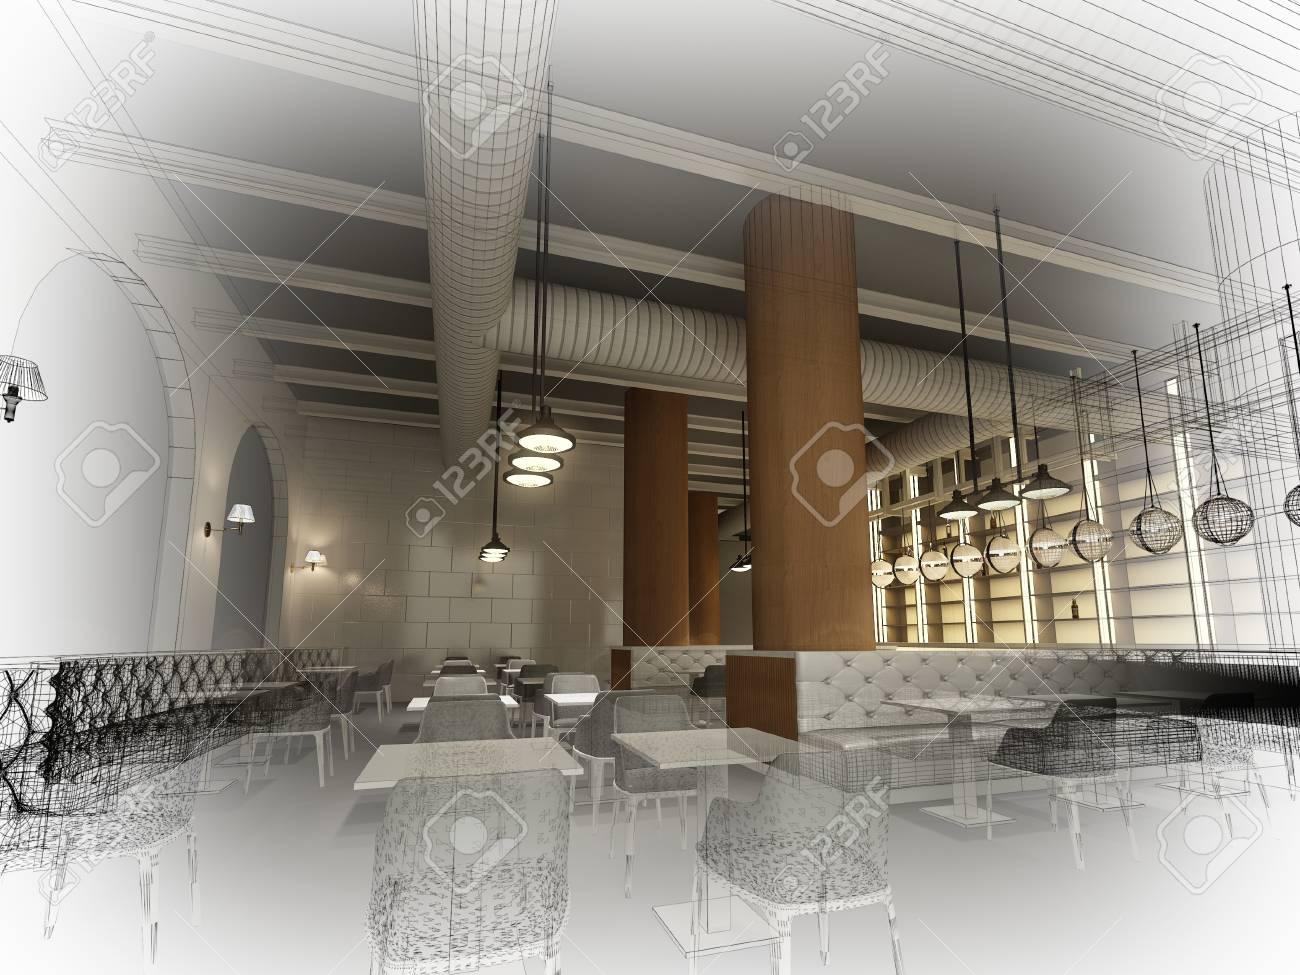 Restaurant Interieur Design.Sketch Design Of Interior Restaurant 3d Rendering